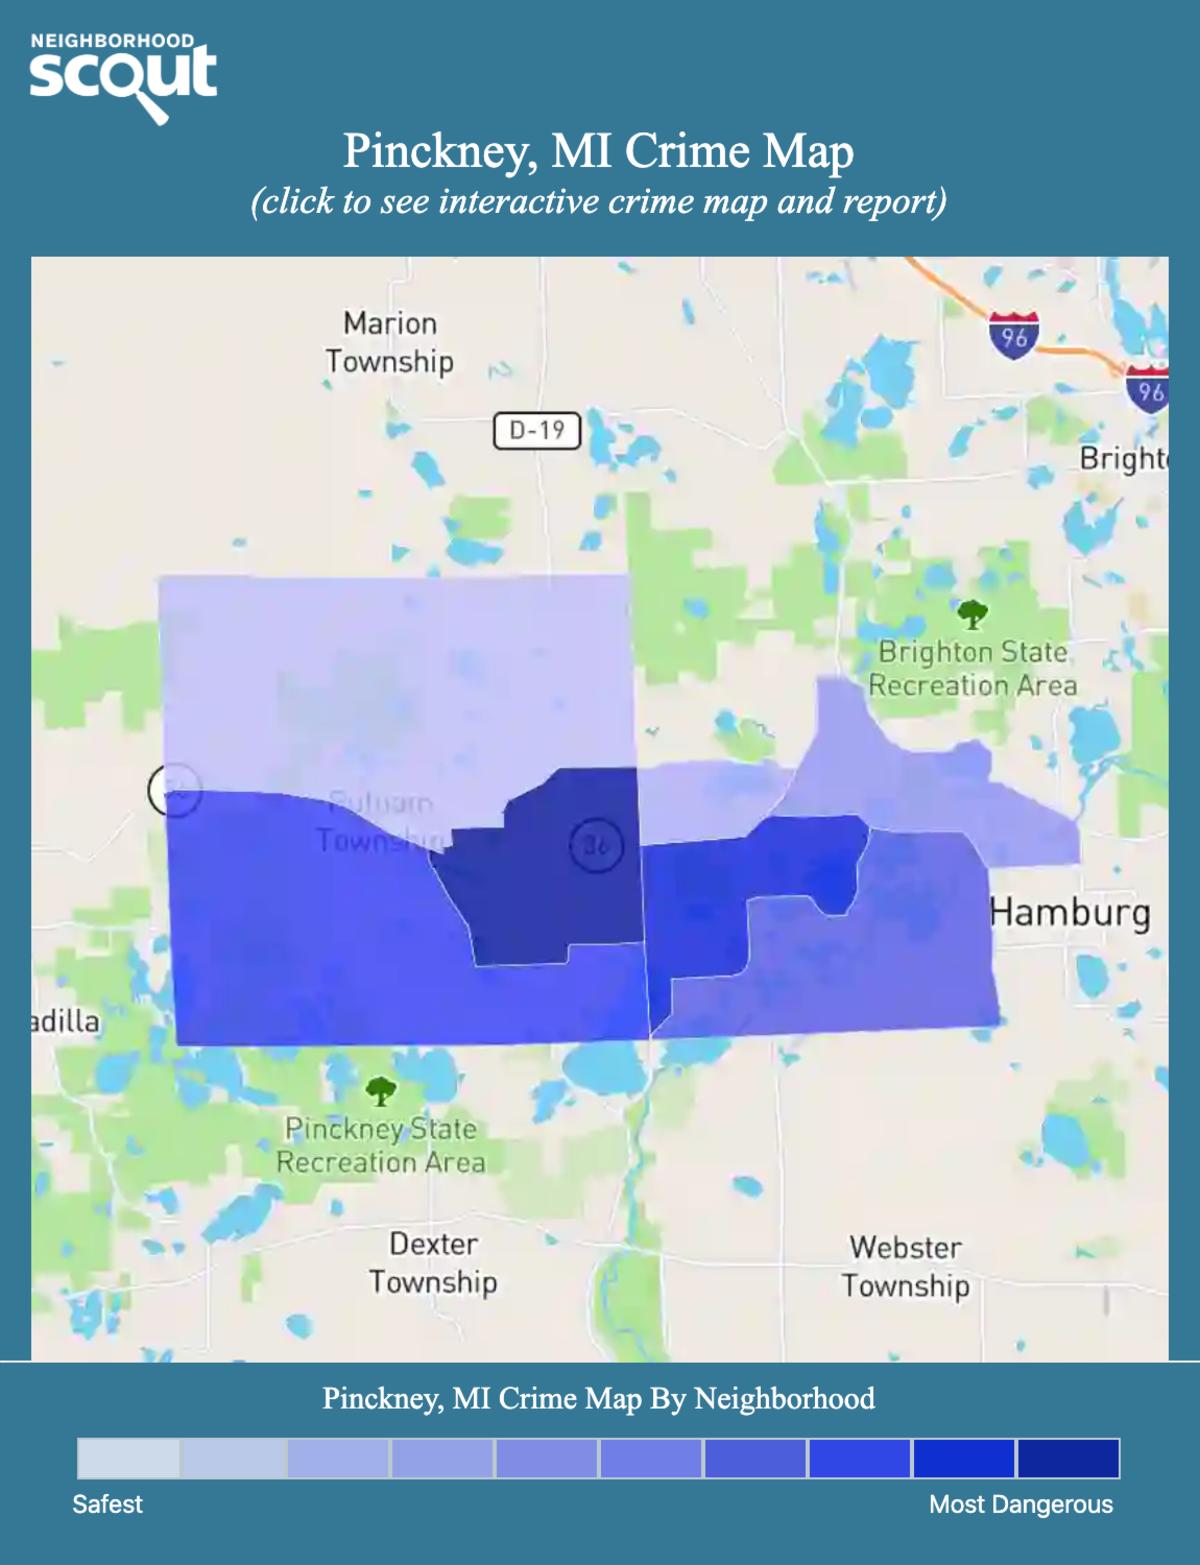 Pinckney, Michigan crime map